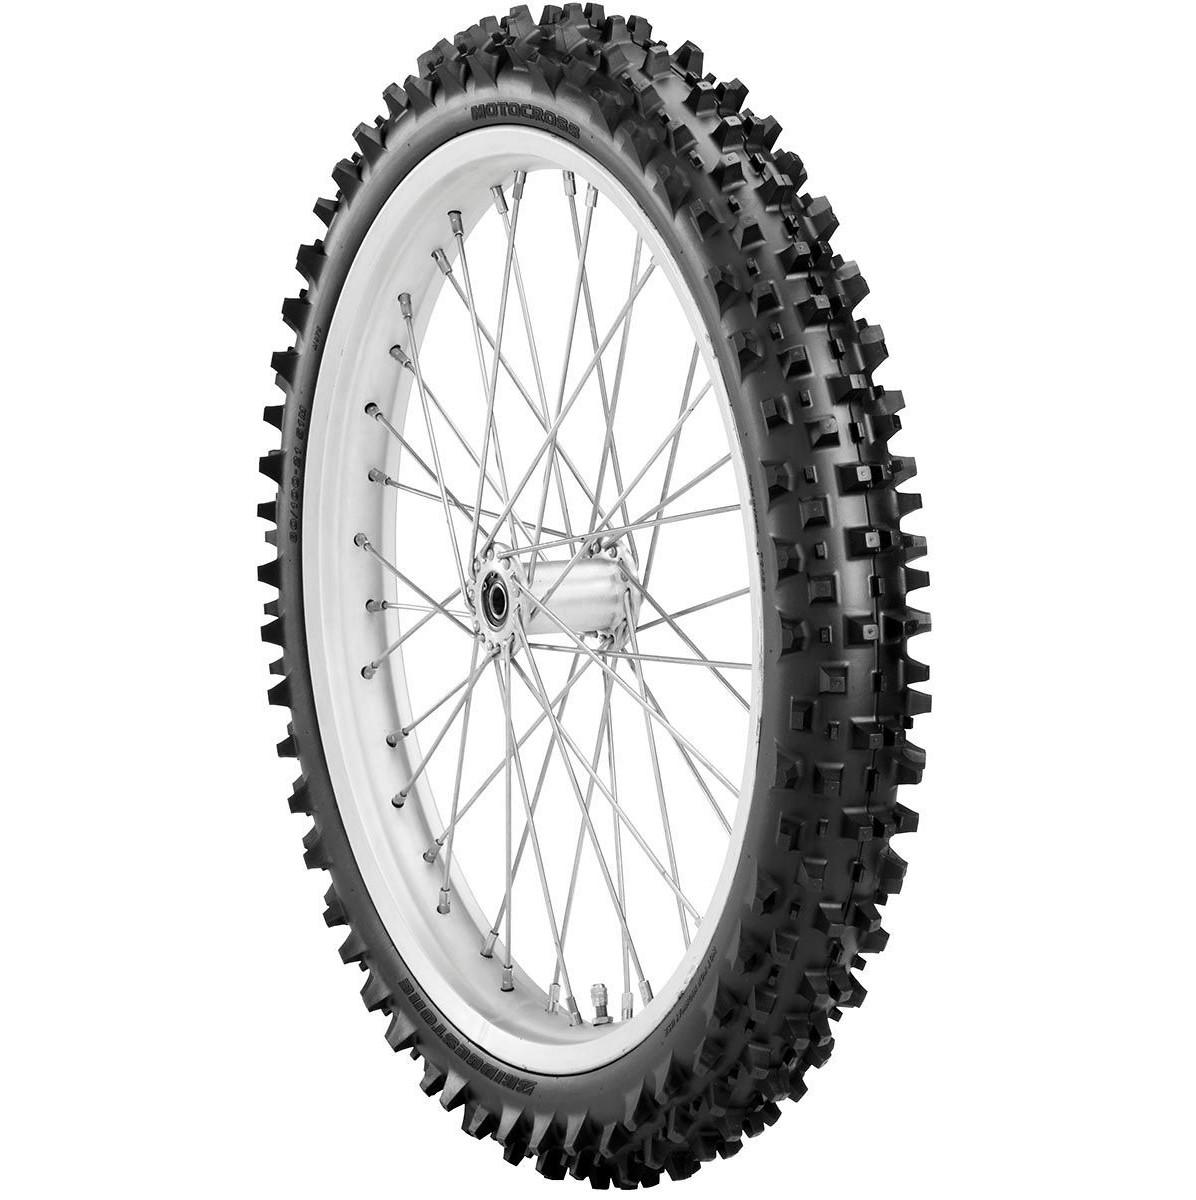 Bridgestone M101 Soft Terrain Tire  0000-bridgestone-m101-soft-terrain-front-tire-mcss.jpg